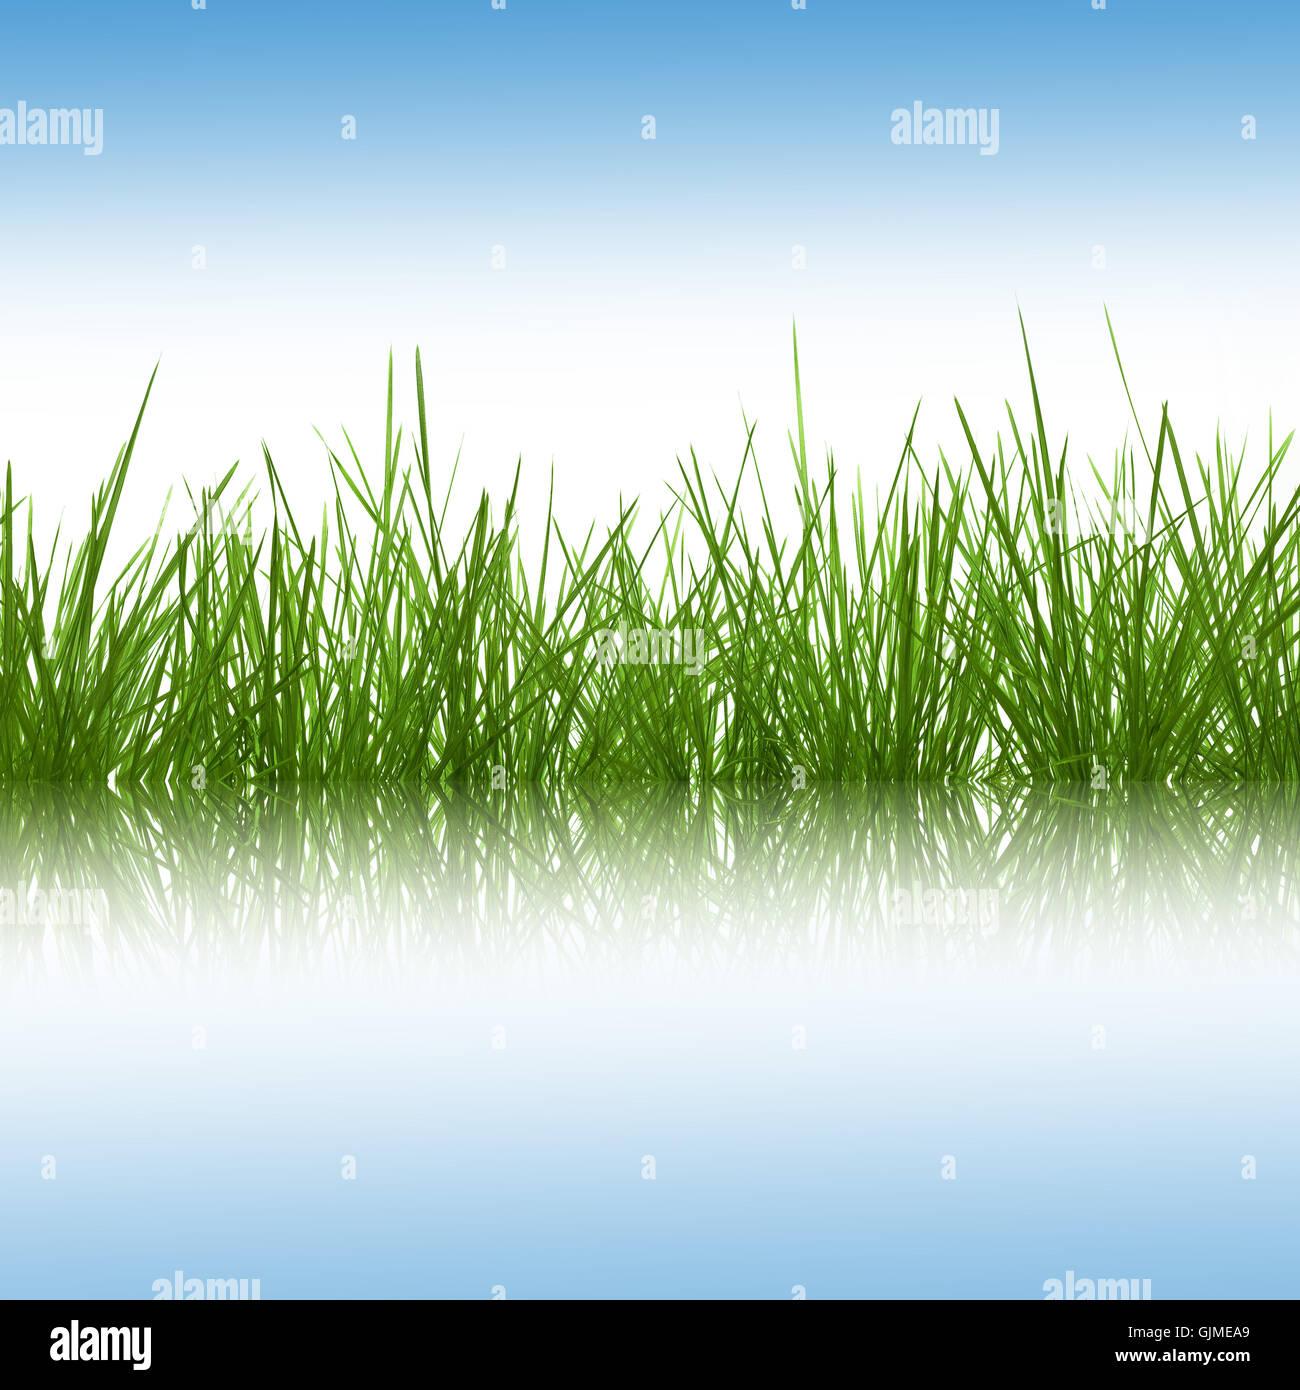 blue mirroring firmament - Stock Image